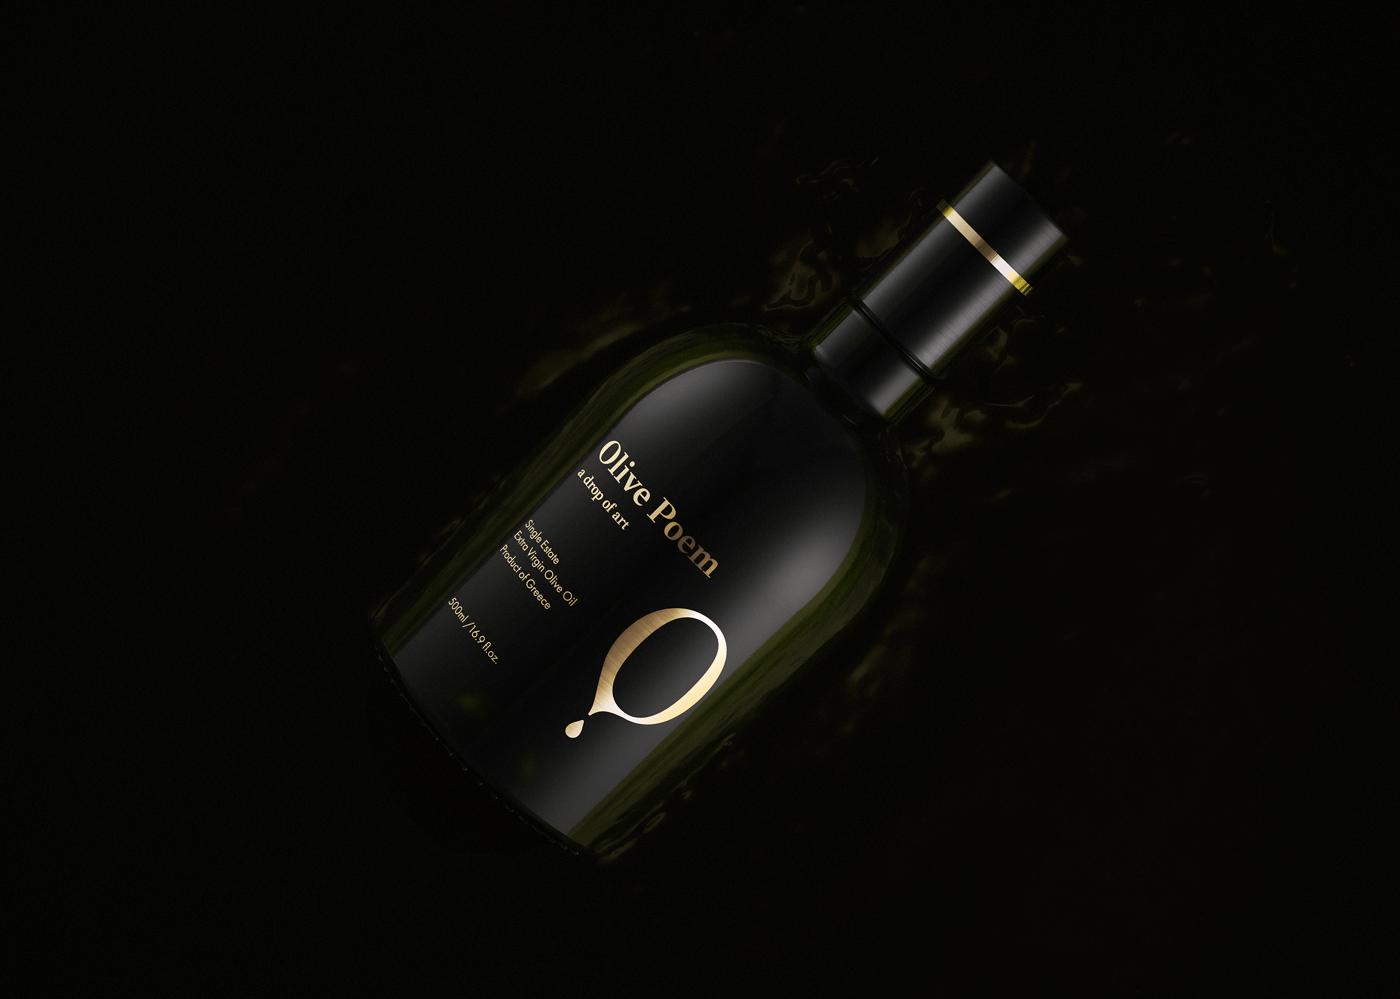 Packaging,graphic design ,Olive Oil,brand identity,branding ,bottle,evoo,gold,screen printing